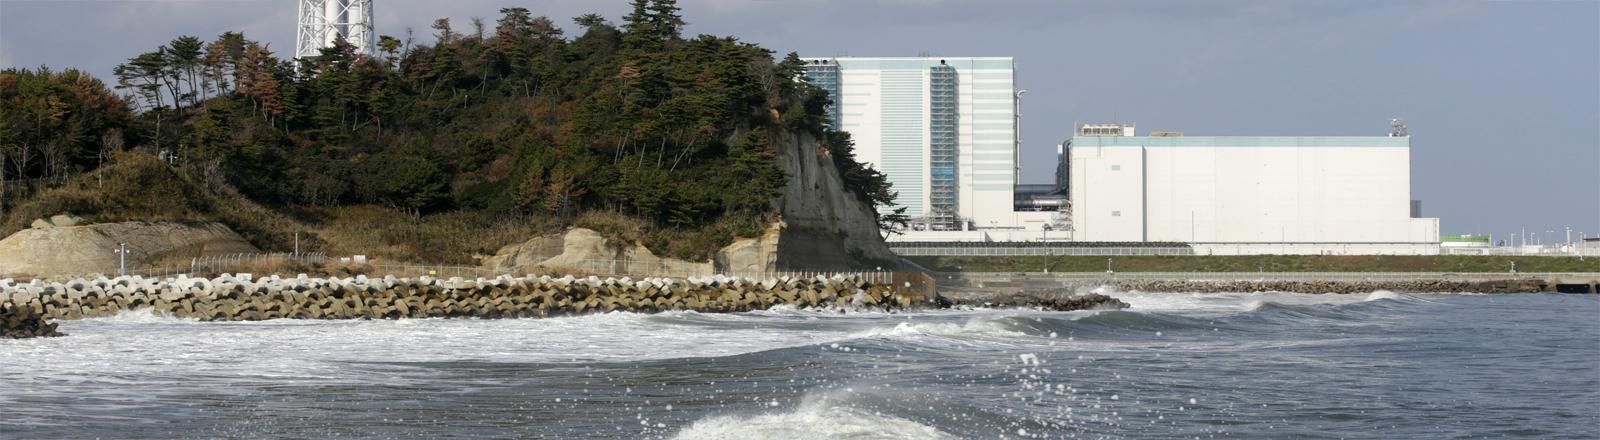 Der Reaktor Fukushima am Tag nach dem nachbeben am 22.11.2016.